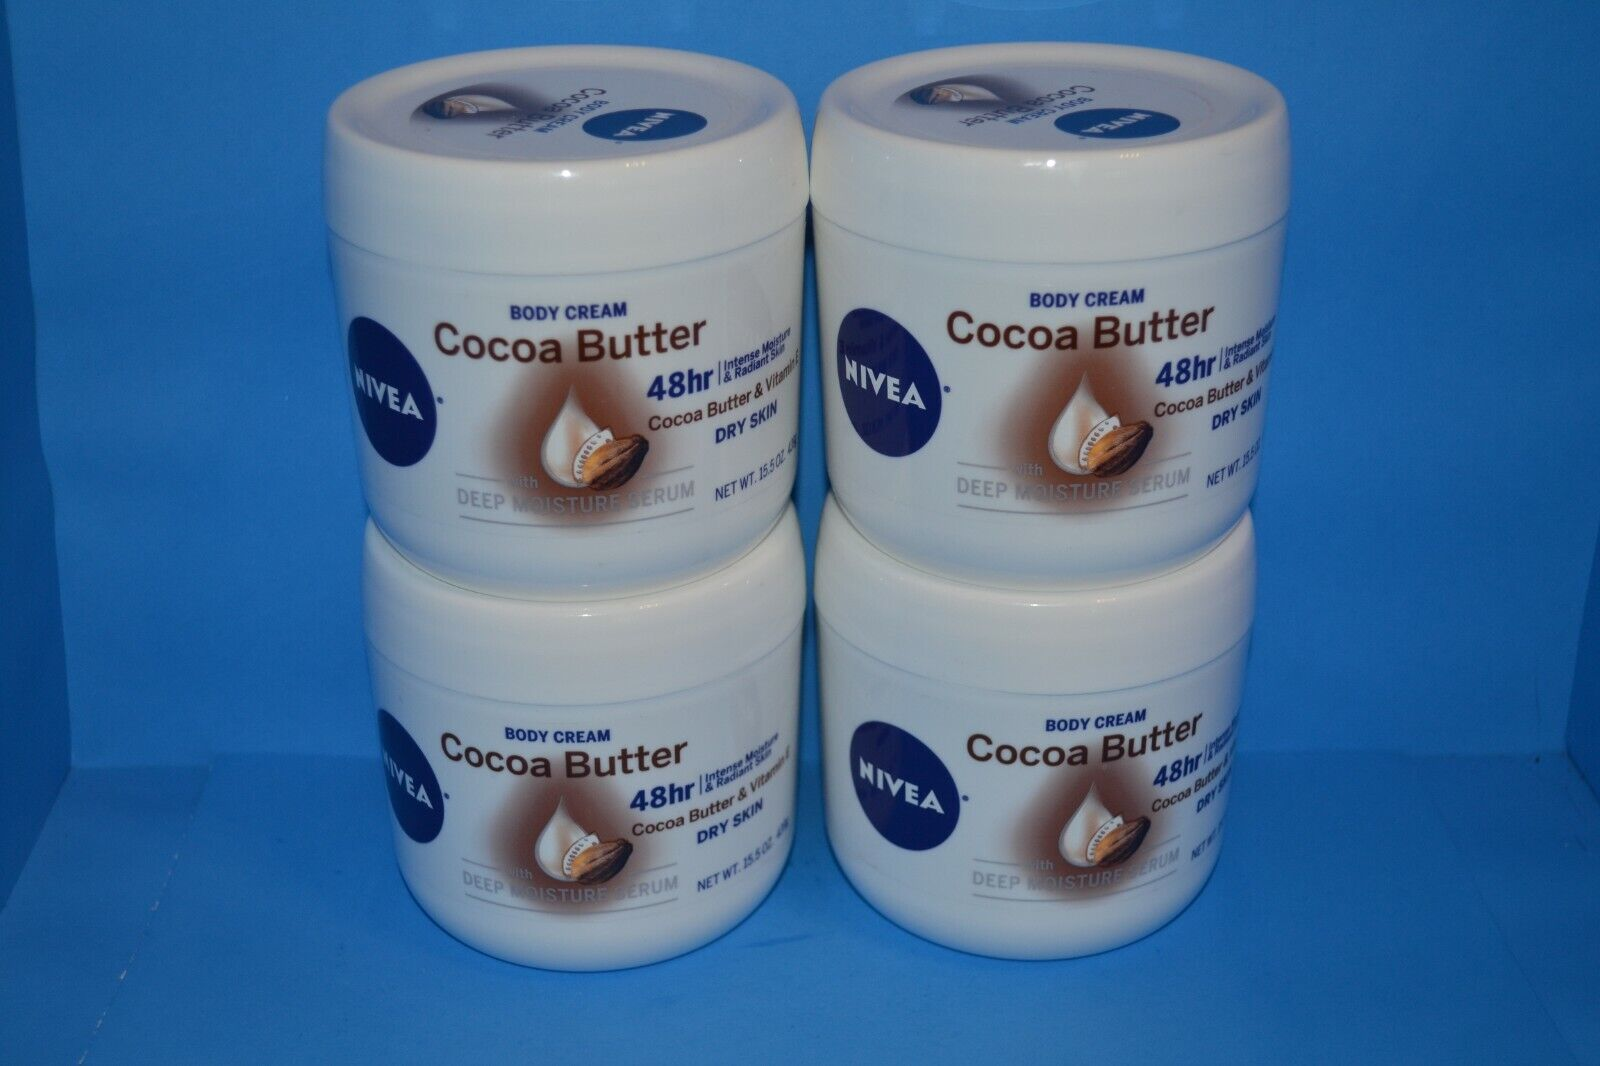 Nivea Cocoa Butter Body Cream, 15.5 Ounce New